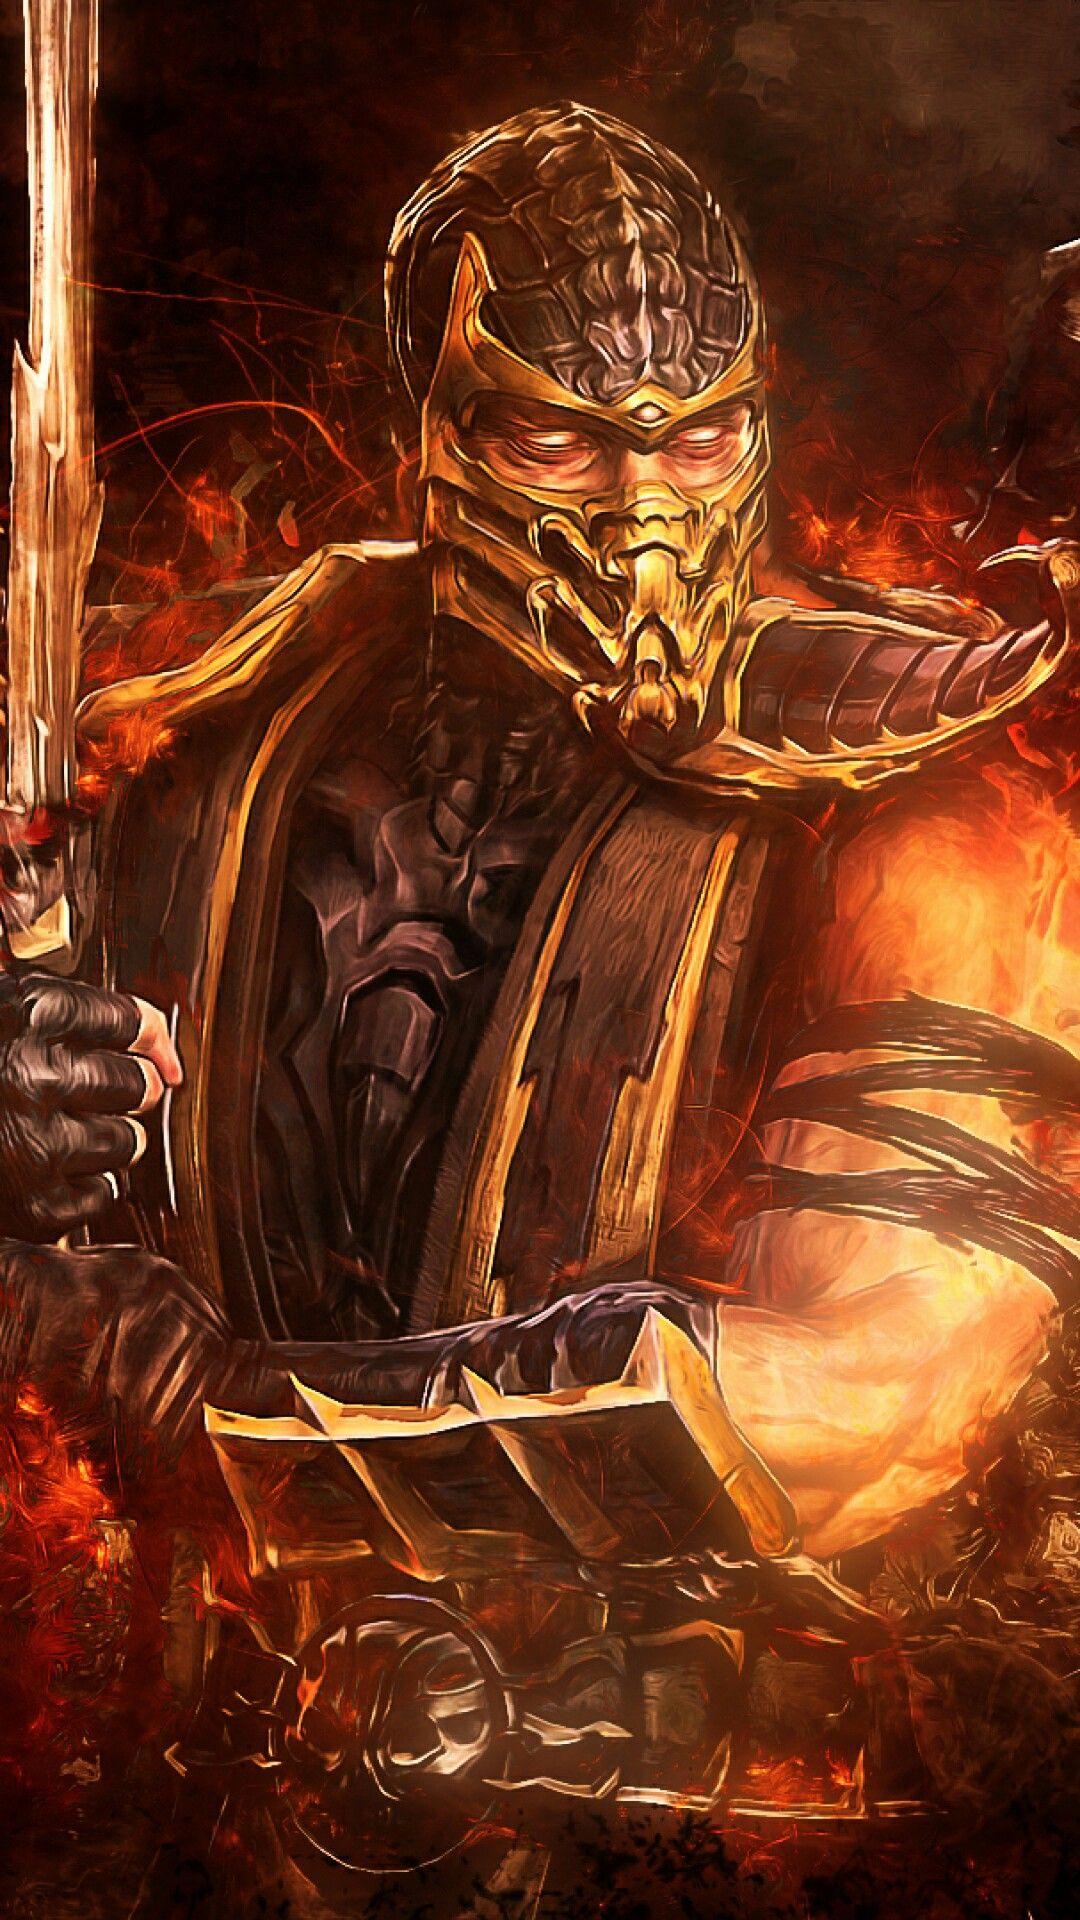 Scorpion Visit Now For 3d Dragon Ball Z Compression Shirts Now O Imagenes De Mortal Kombat Personajes De Mortal Kombat Mortal Kombat X Fondos De Pantalla